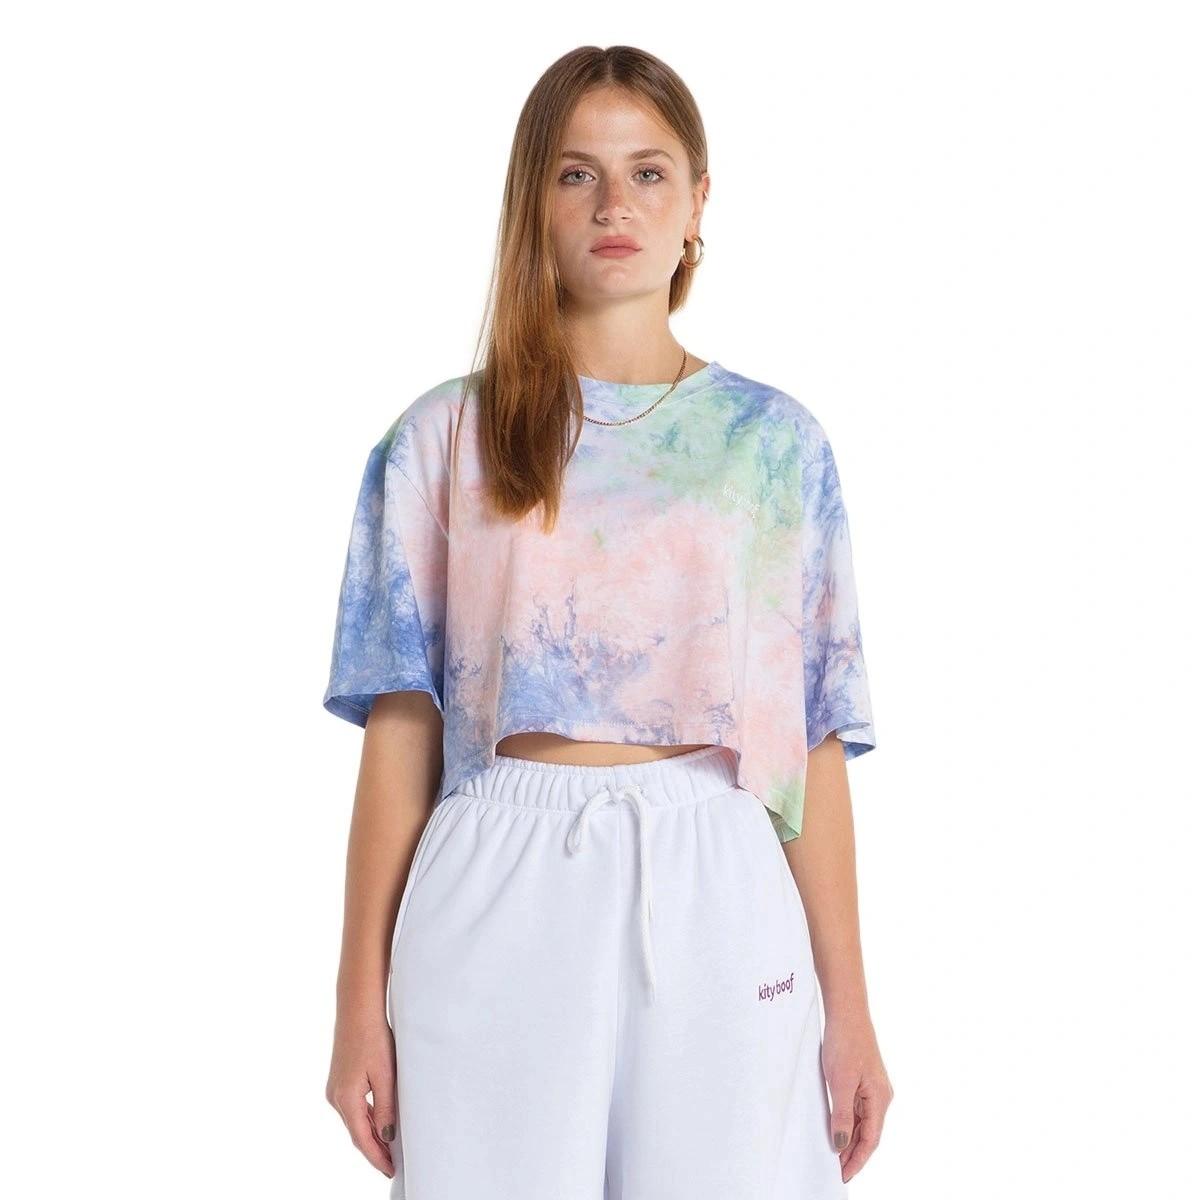 Kity Boof Cropped T-Shirt Tie-Dye